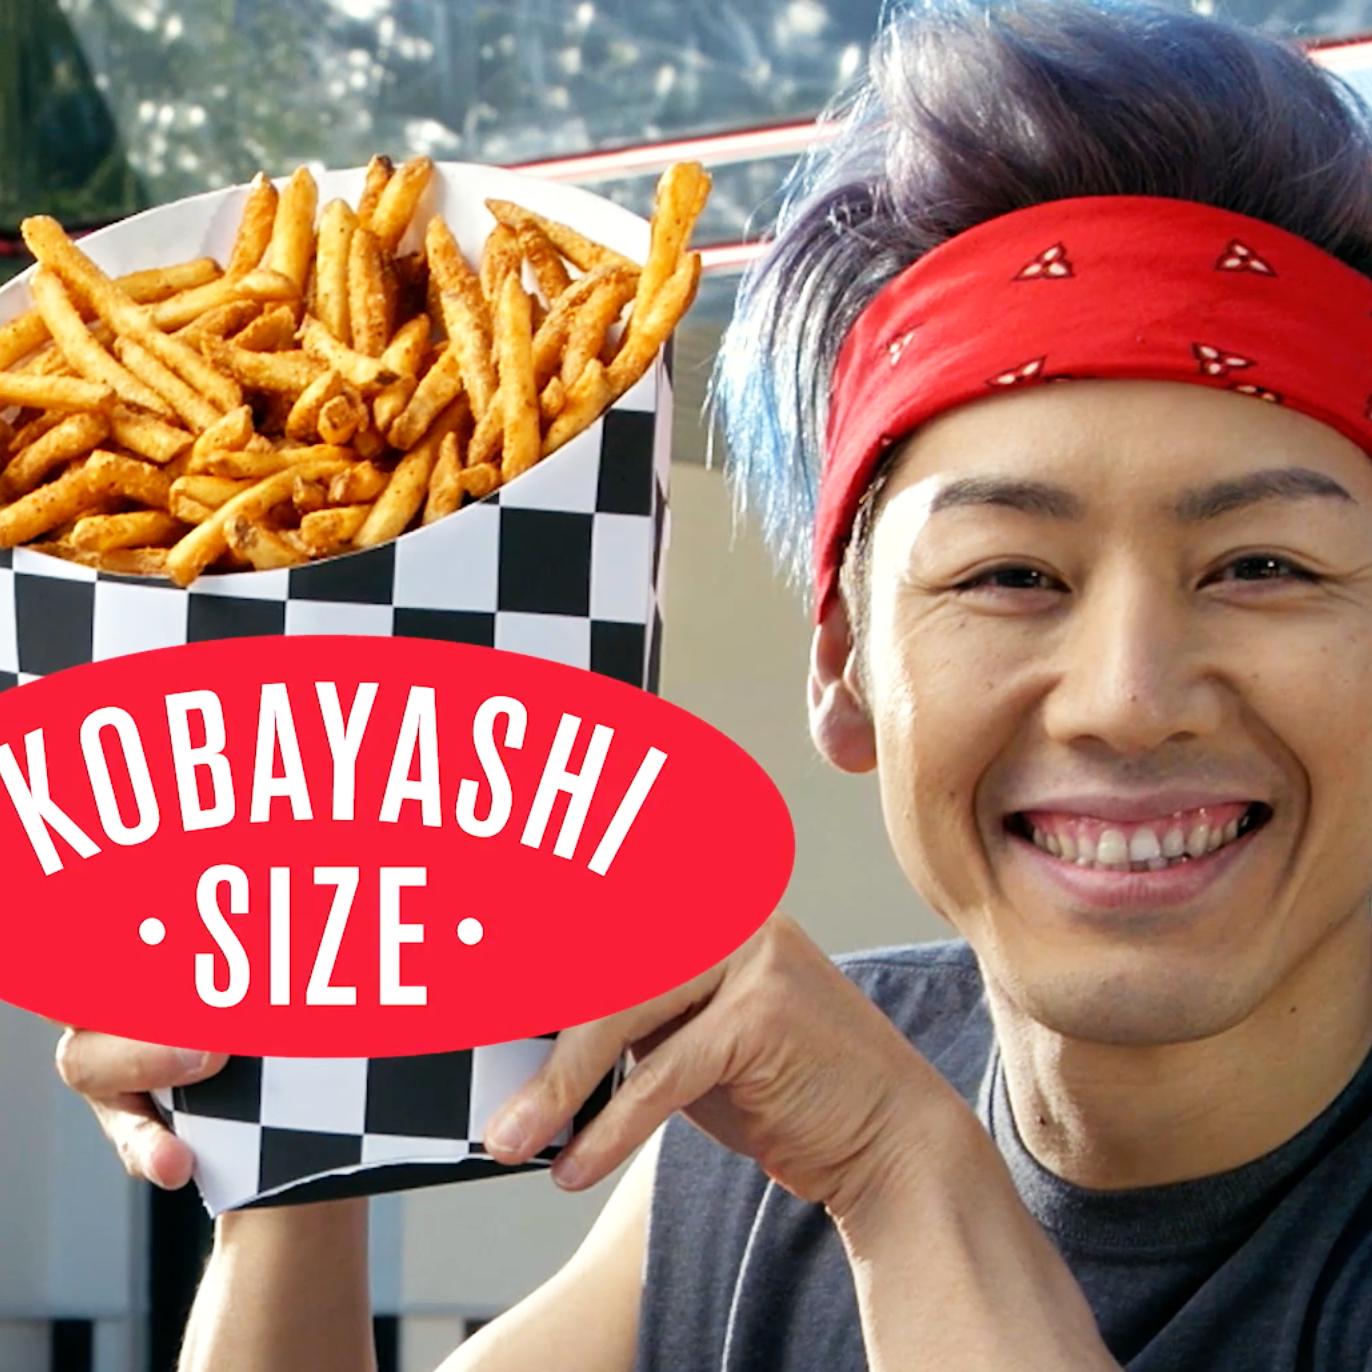 CHECKERS - KOBAYASHI FRIES – 2018 GOLD ADDY WINNER